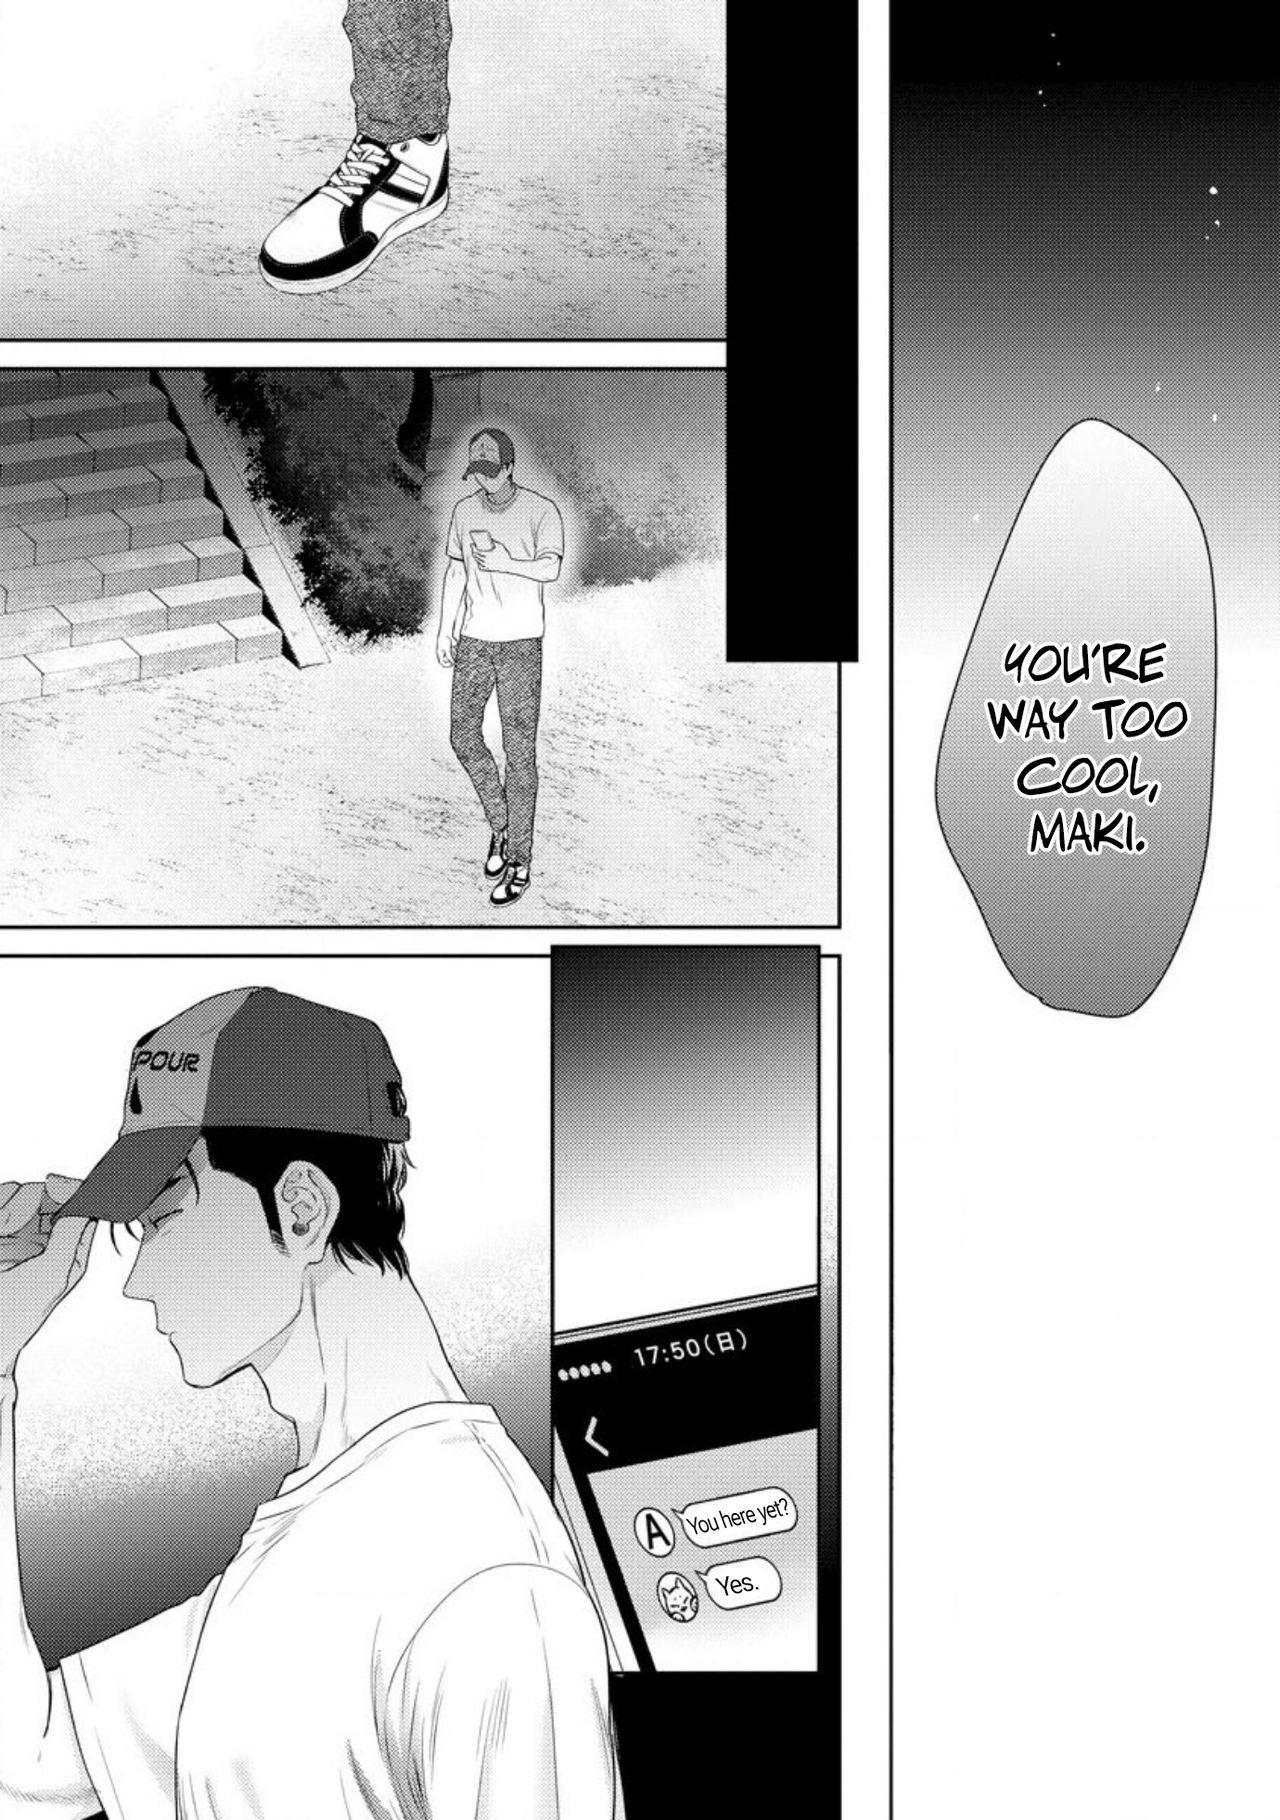 [Hiiragi Nozomu] Nakasete Yaru yo Yankee-kun   I'll Make You Cry Ch. 1-5 + Extras [English] [Digital] 111